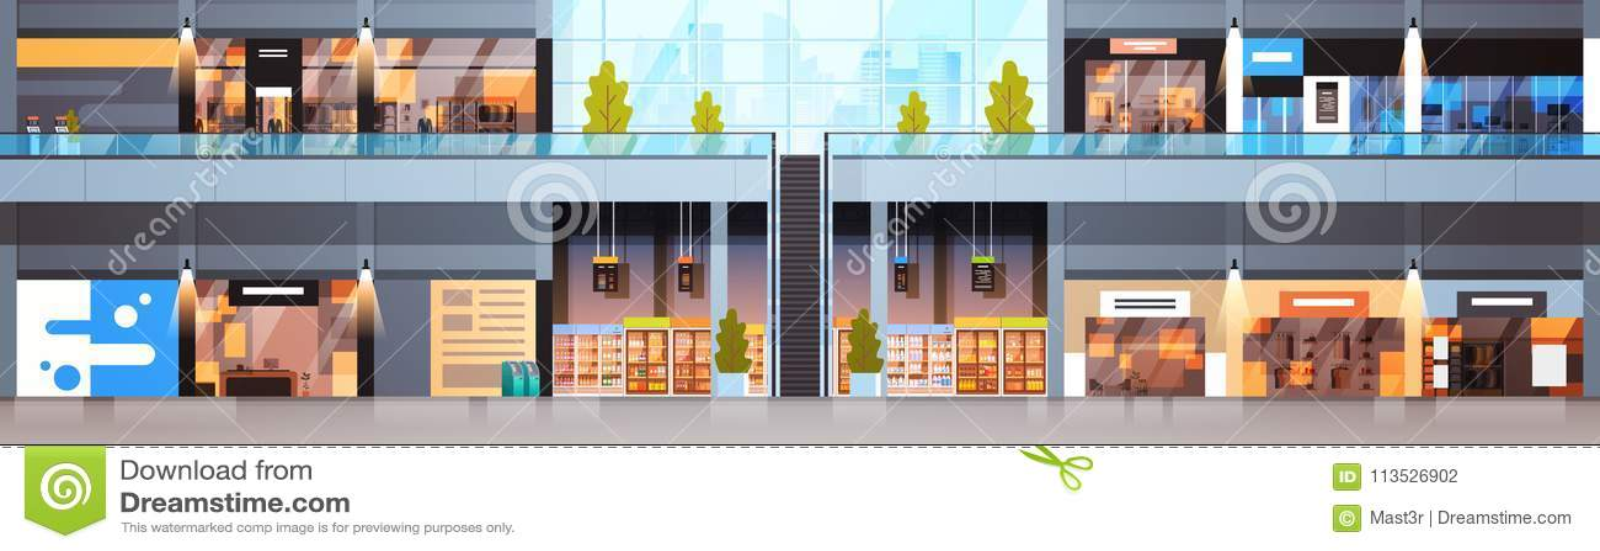 Interior Retail Stock Illustrations 16 718 Interior Retail Stock Illustrations Vectors Clipart Dreamstime,Latest Earrings Design 2020 Gold